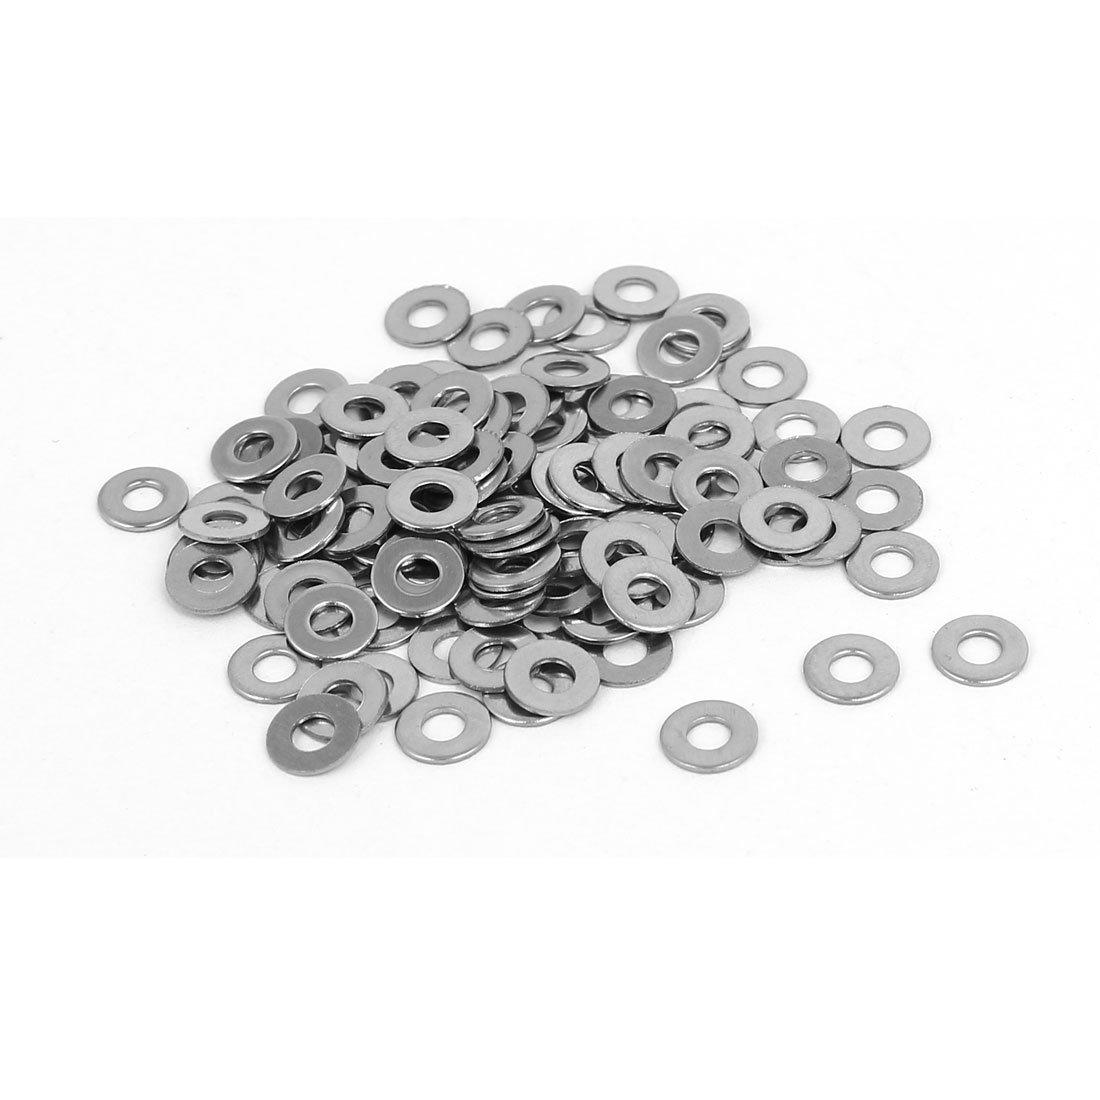 sourcingmap Arandela de nylon M3 x 8 mm x 1 mm redonda plana Junta anillos 100 Piezas